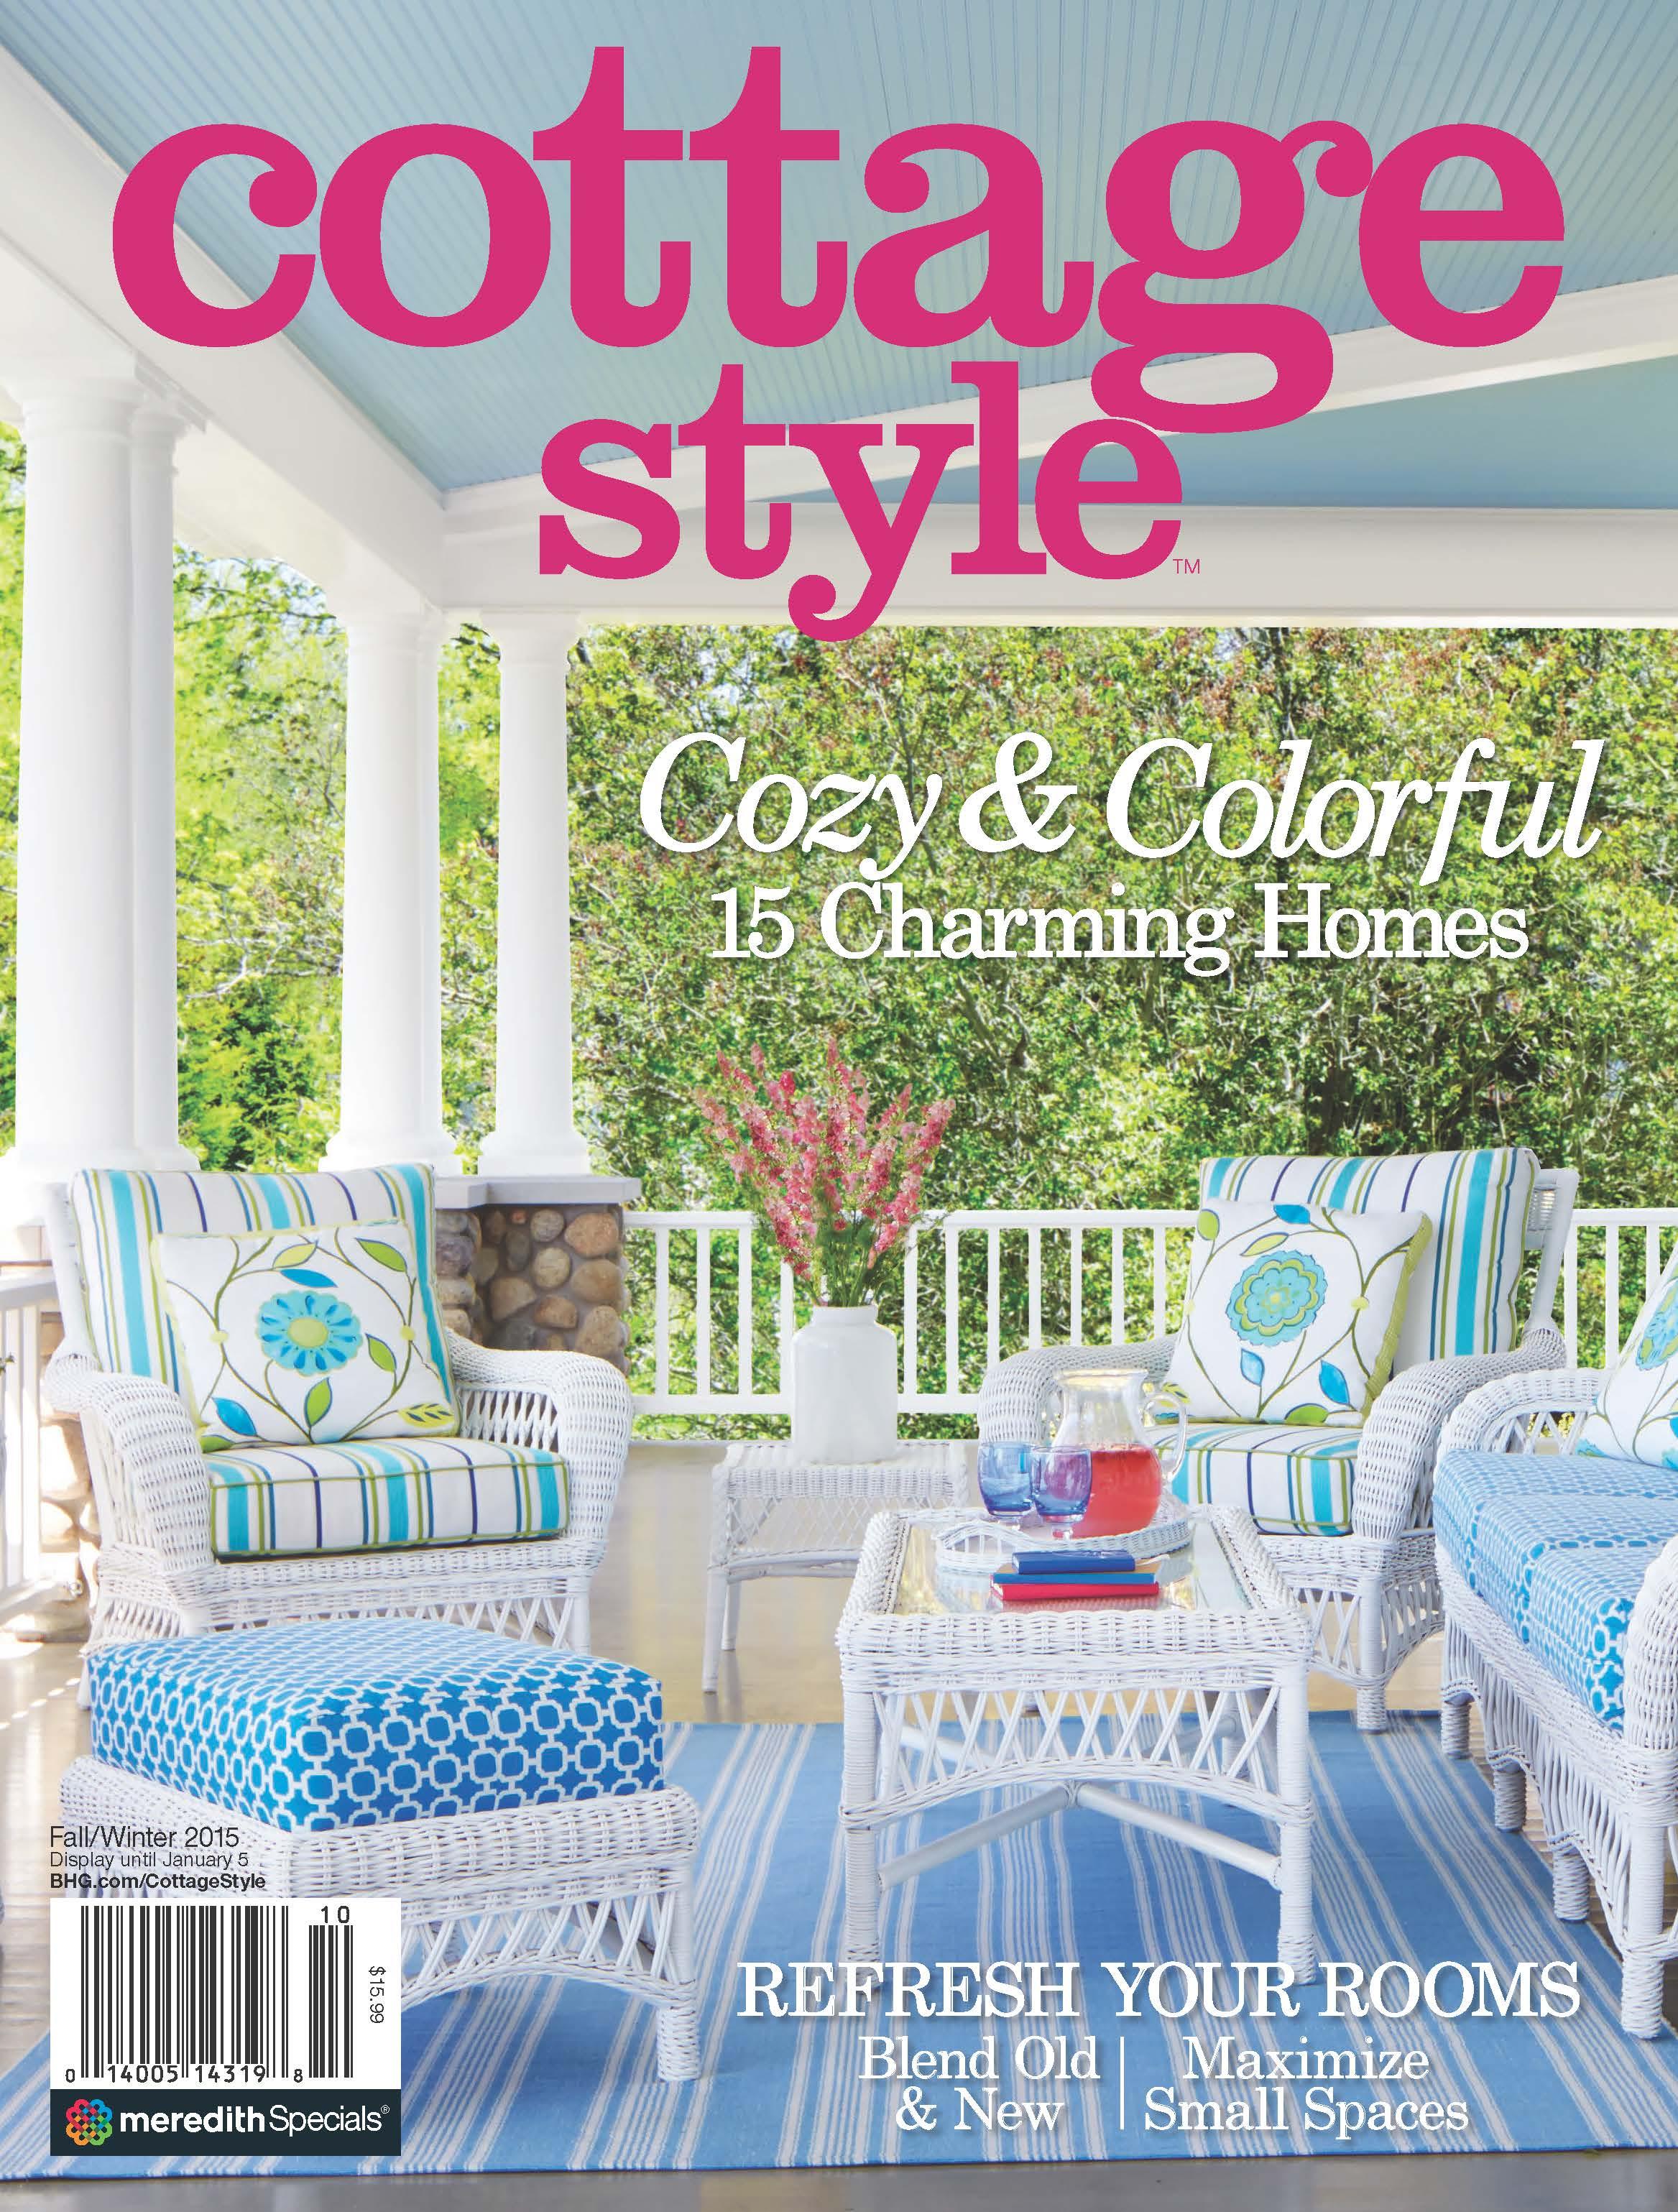 000 CottageStyle FallWin2015.jpg